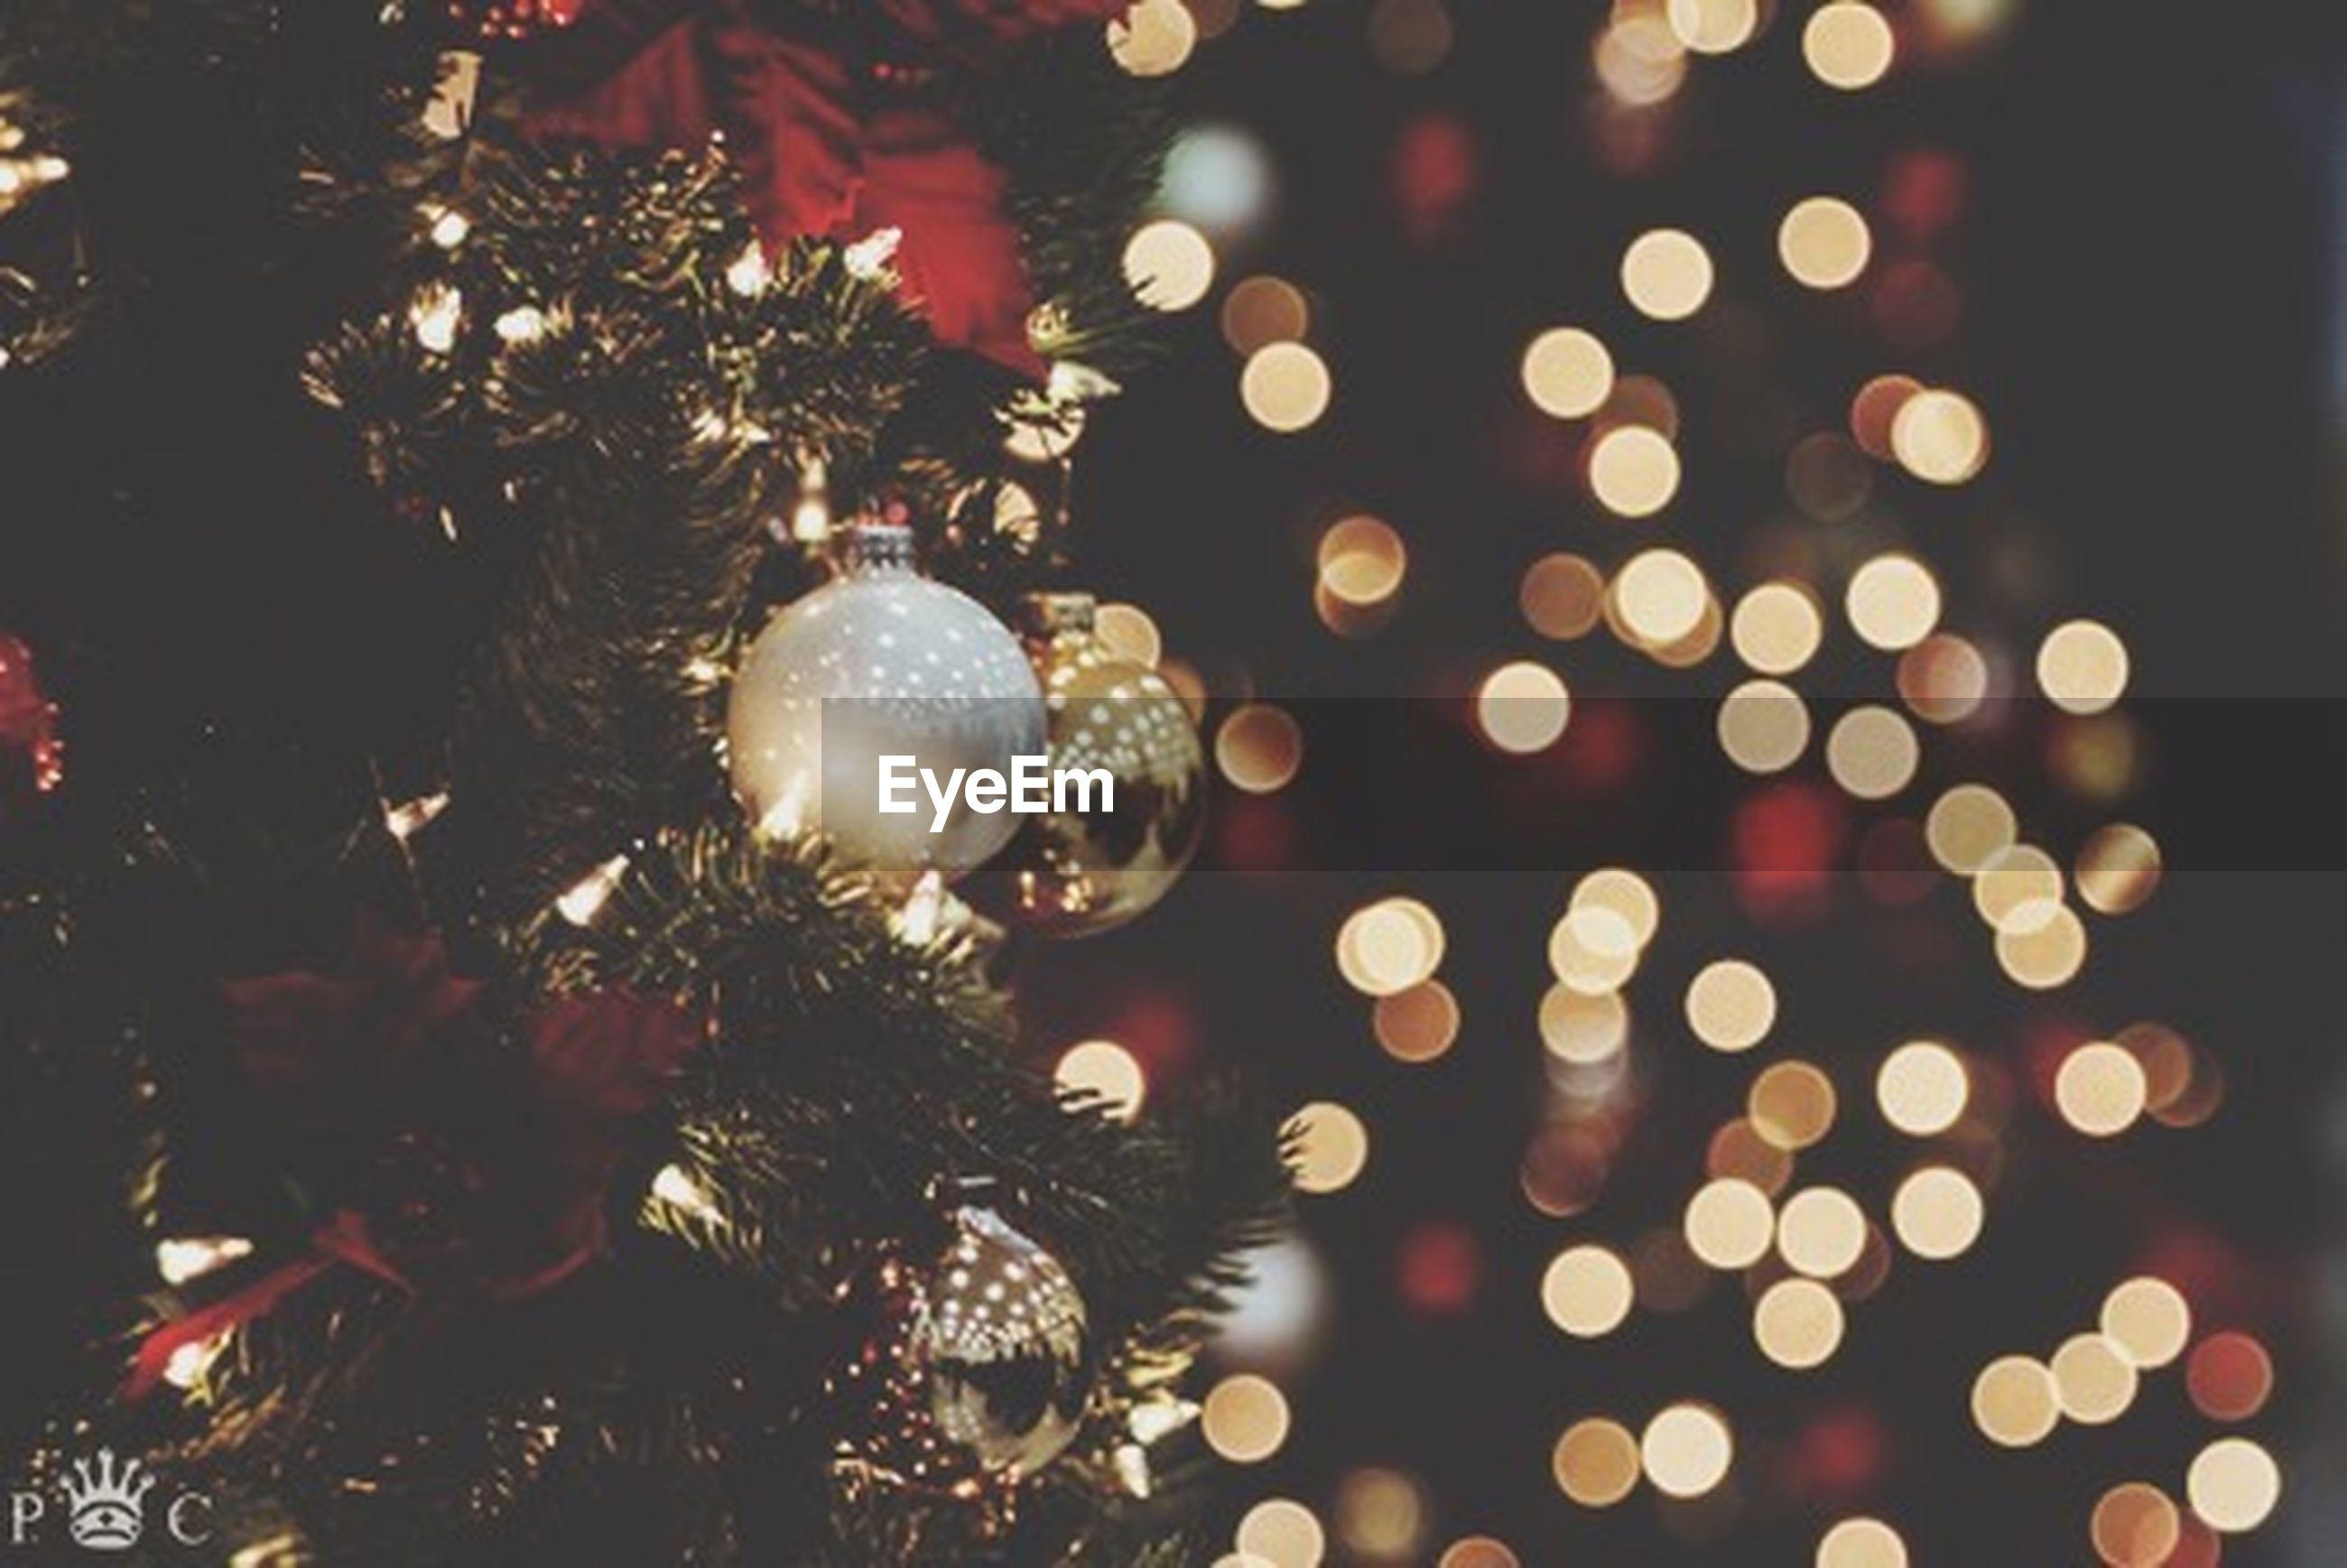 illuminated, decoration, lighting equipment, hanging, low angle view, night, celebration, christmas, sphere, christmas decoration, christmas tree, christmas lights, decor, christmas ornament, indoors, ceiling, tradition, circle, no people, glowing